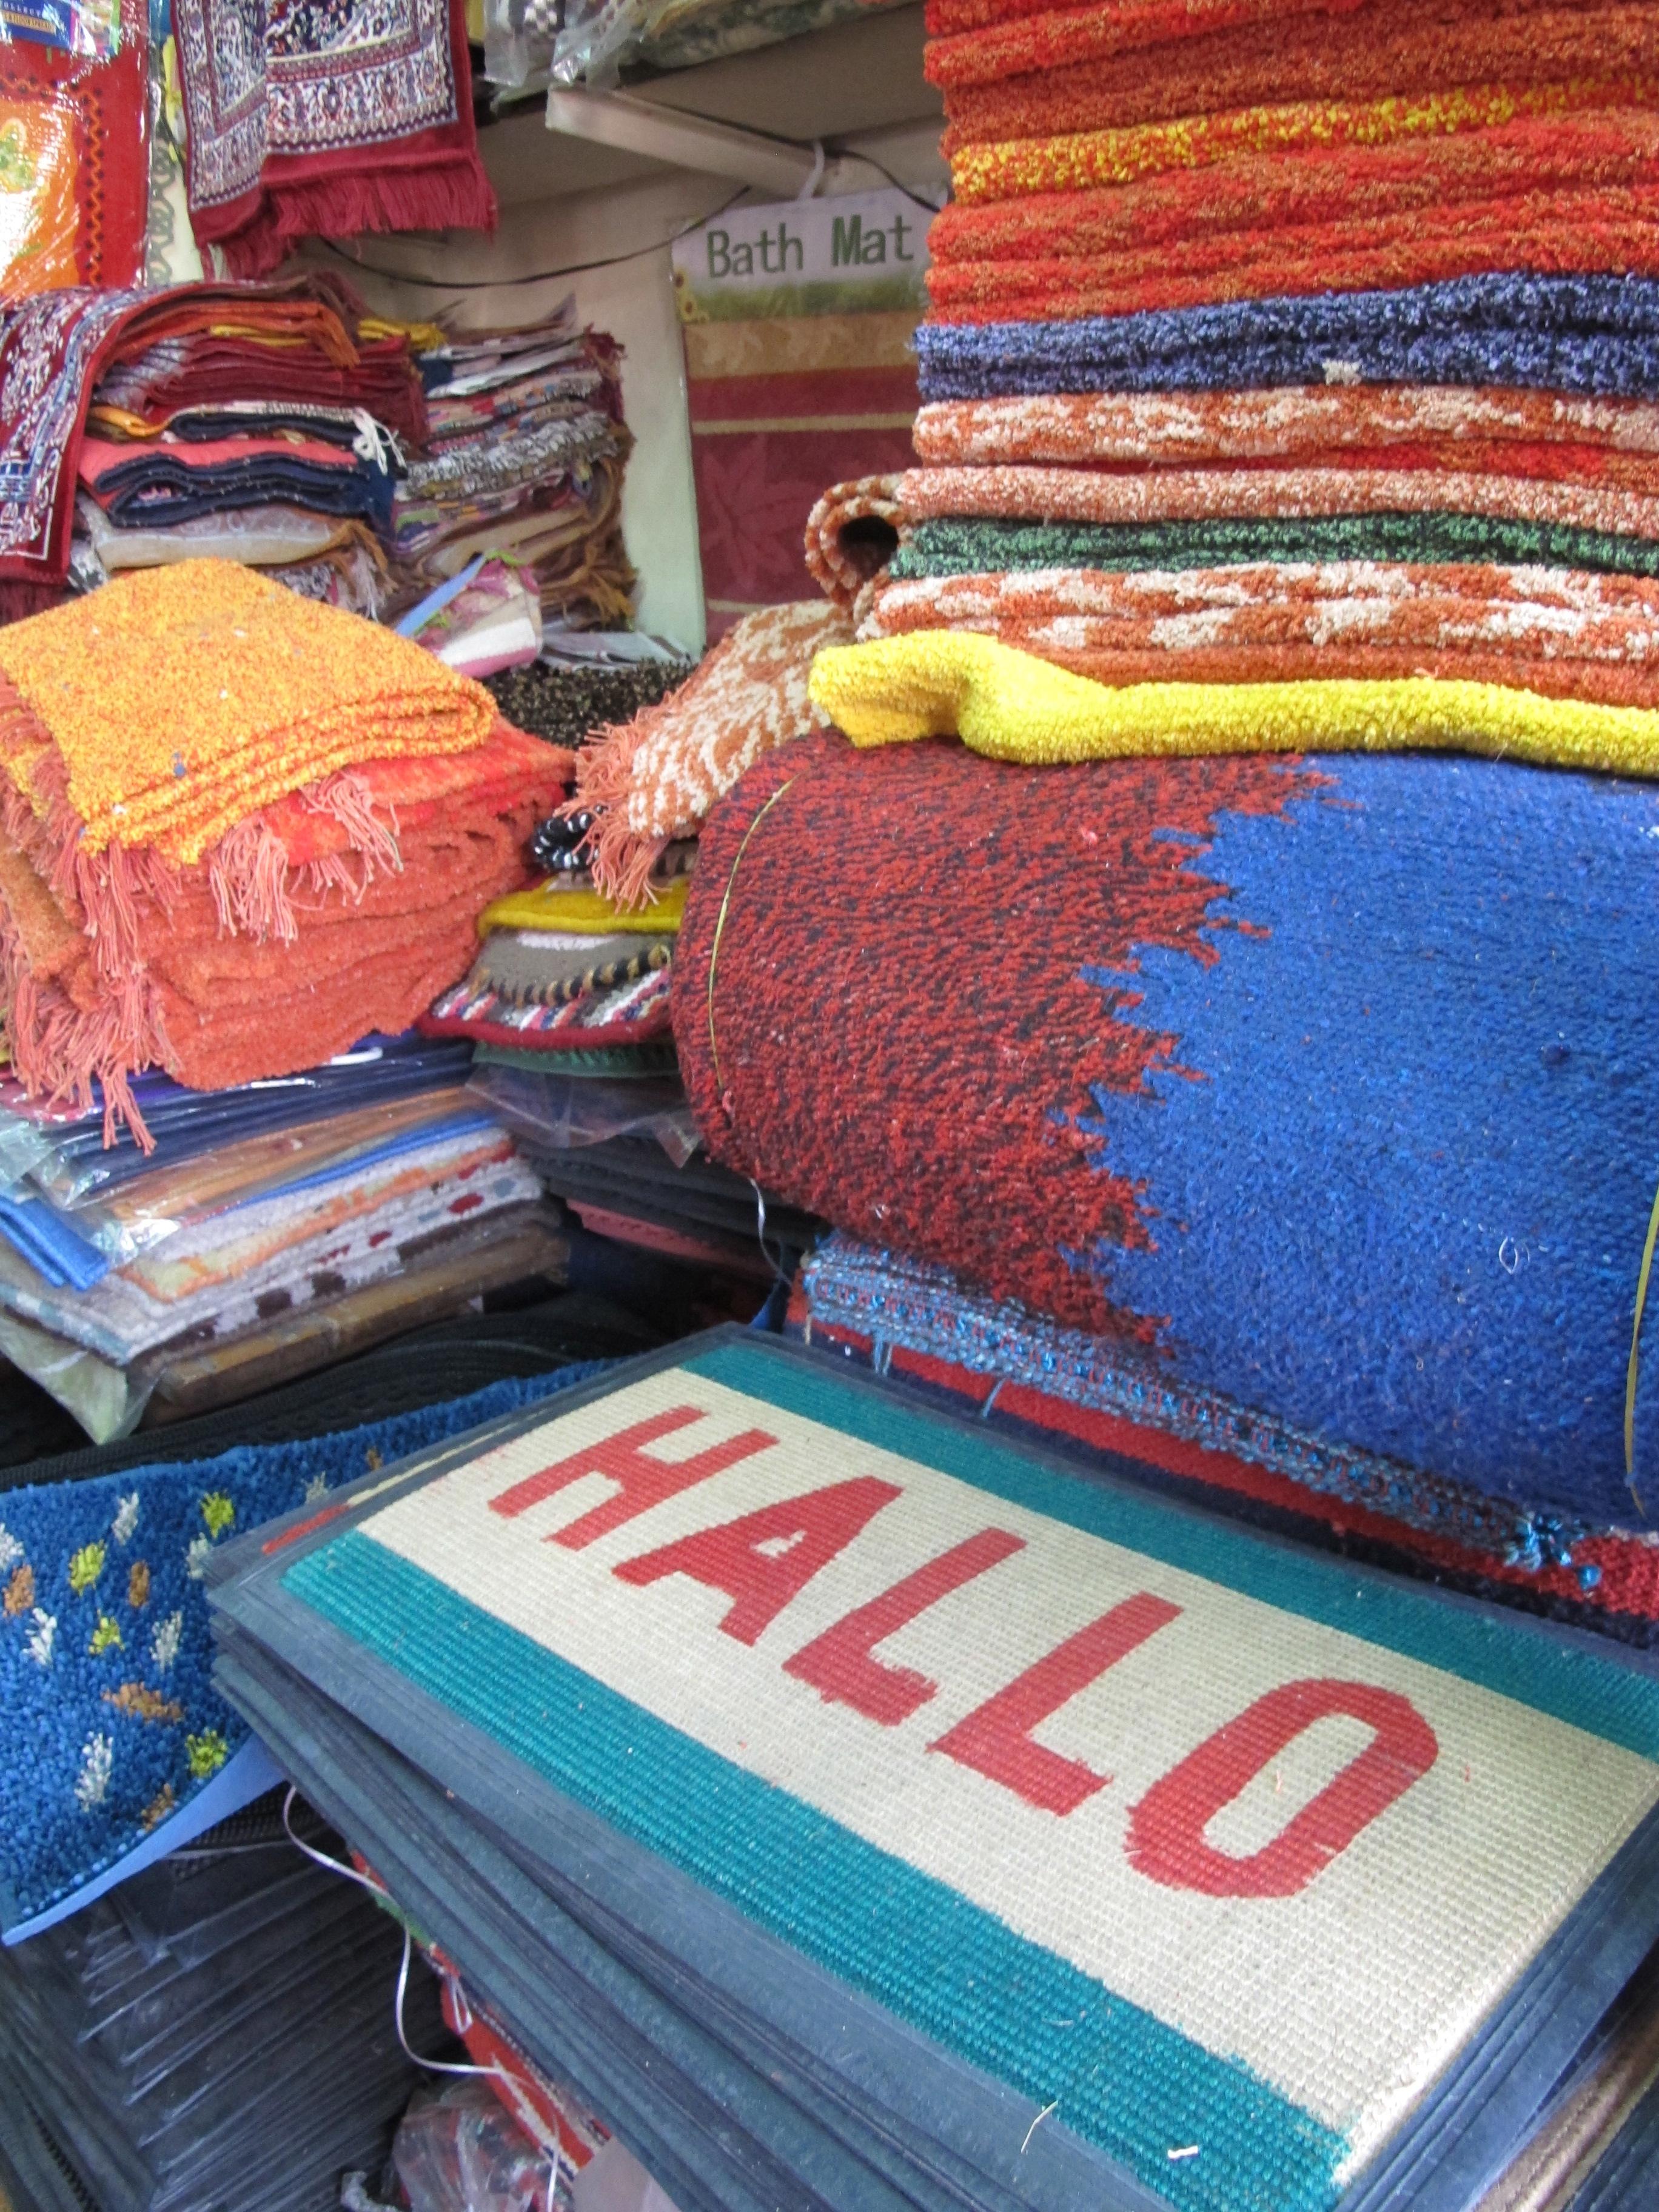 Rugs - Jaipur bazaar - India